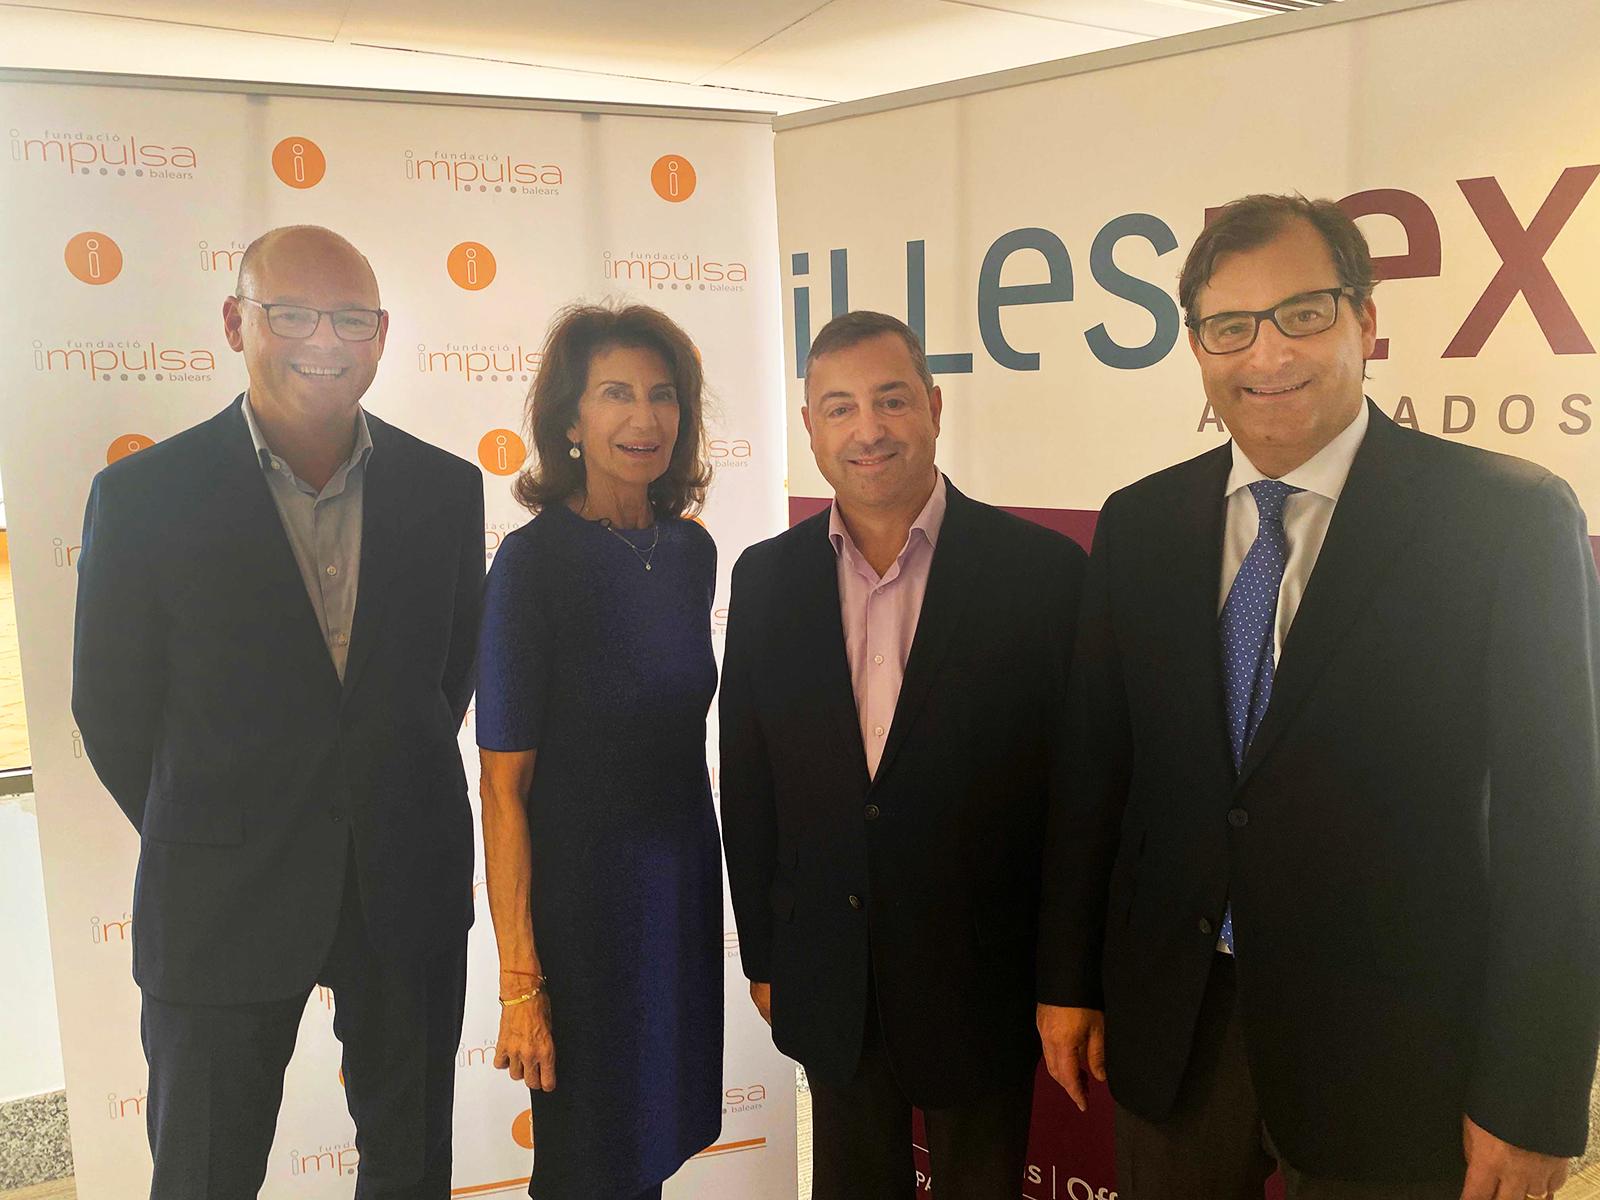 Illeslex Abogados se incorpora a la Fundación Impulsa Balears